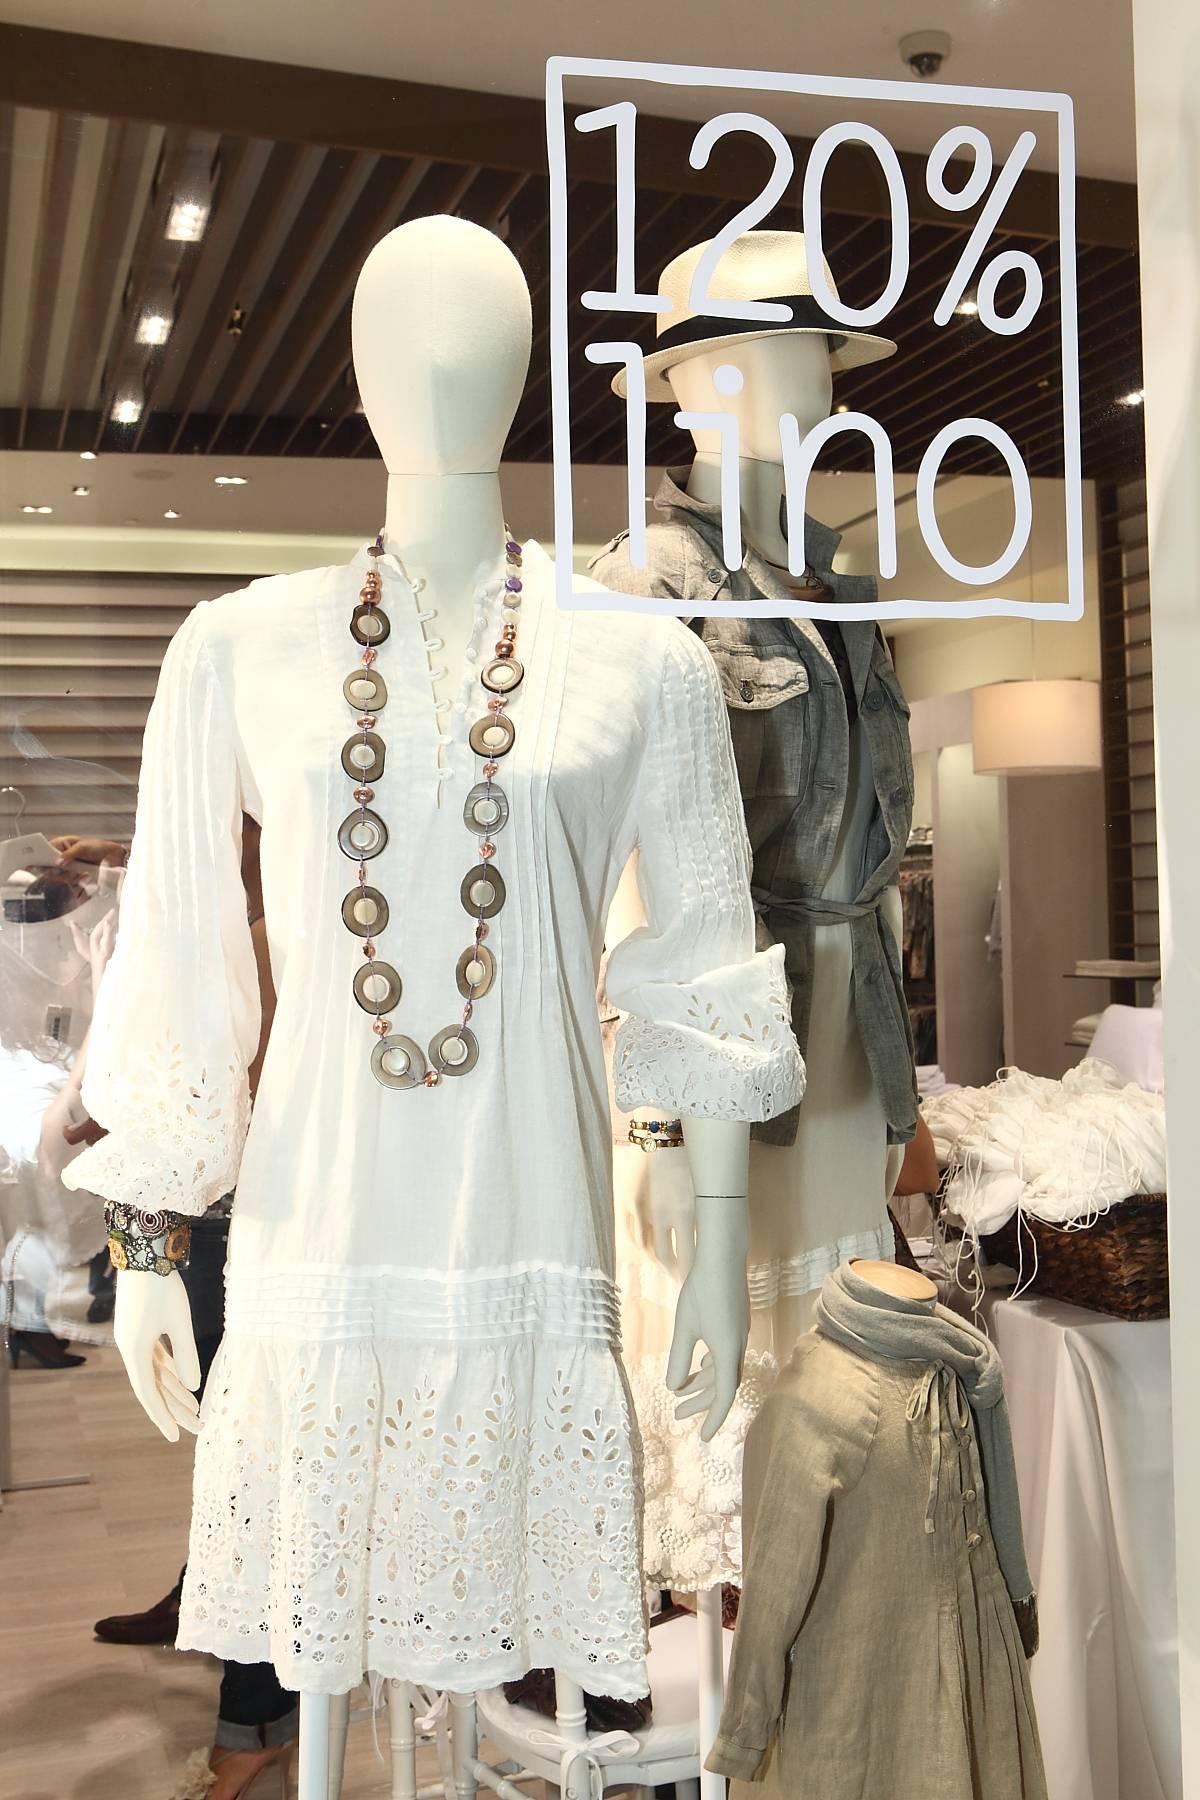 120% Lino Opens First U.S. Store At Merrick Park - Haute Living